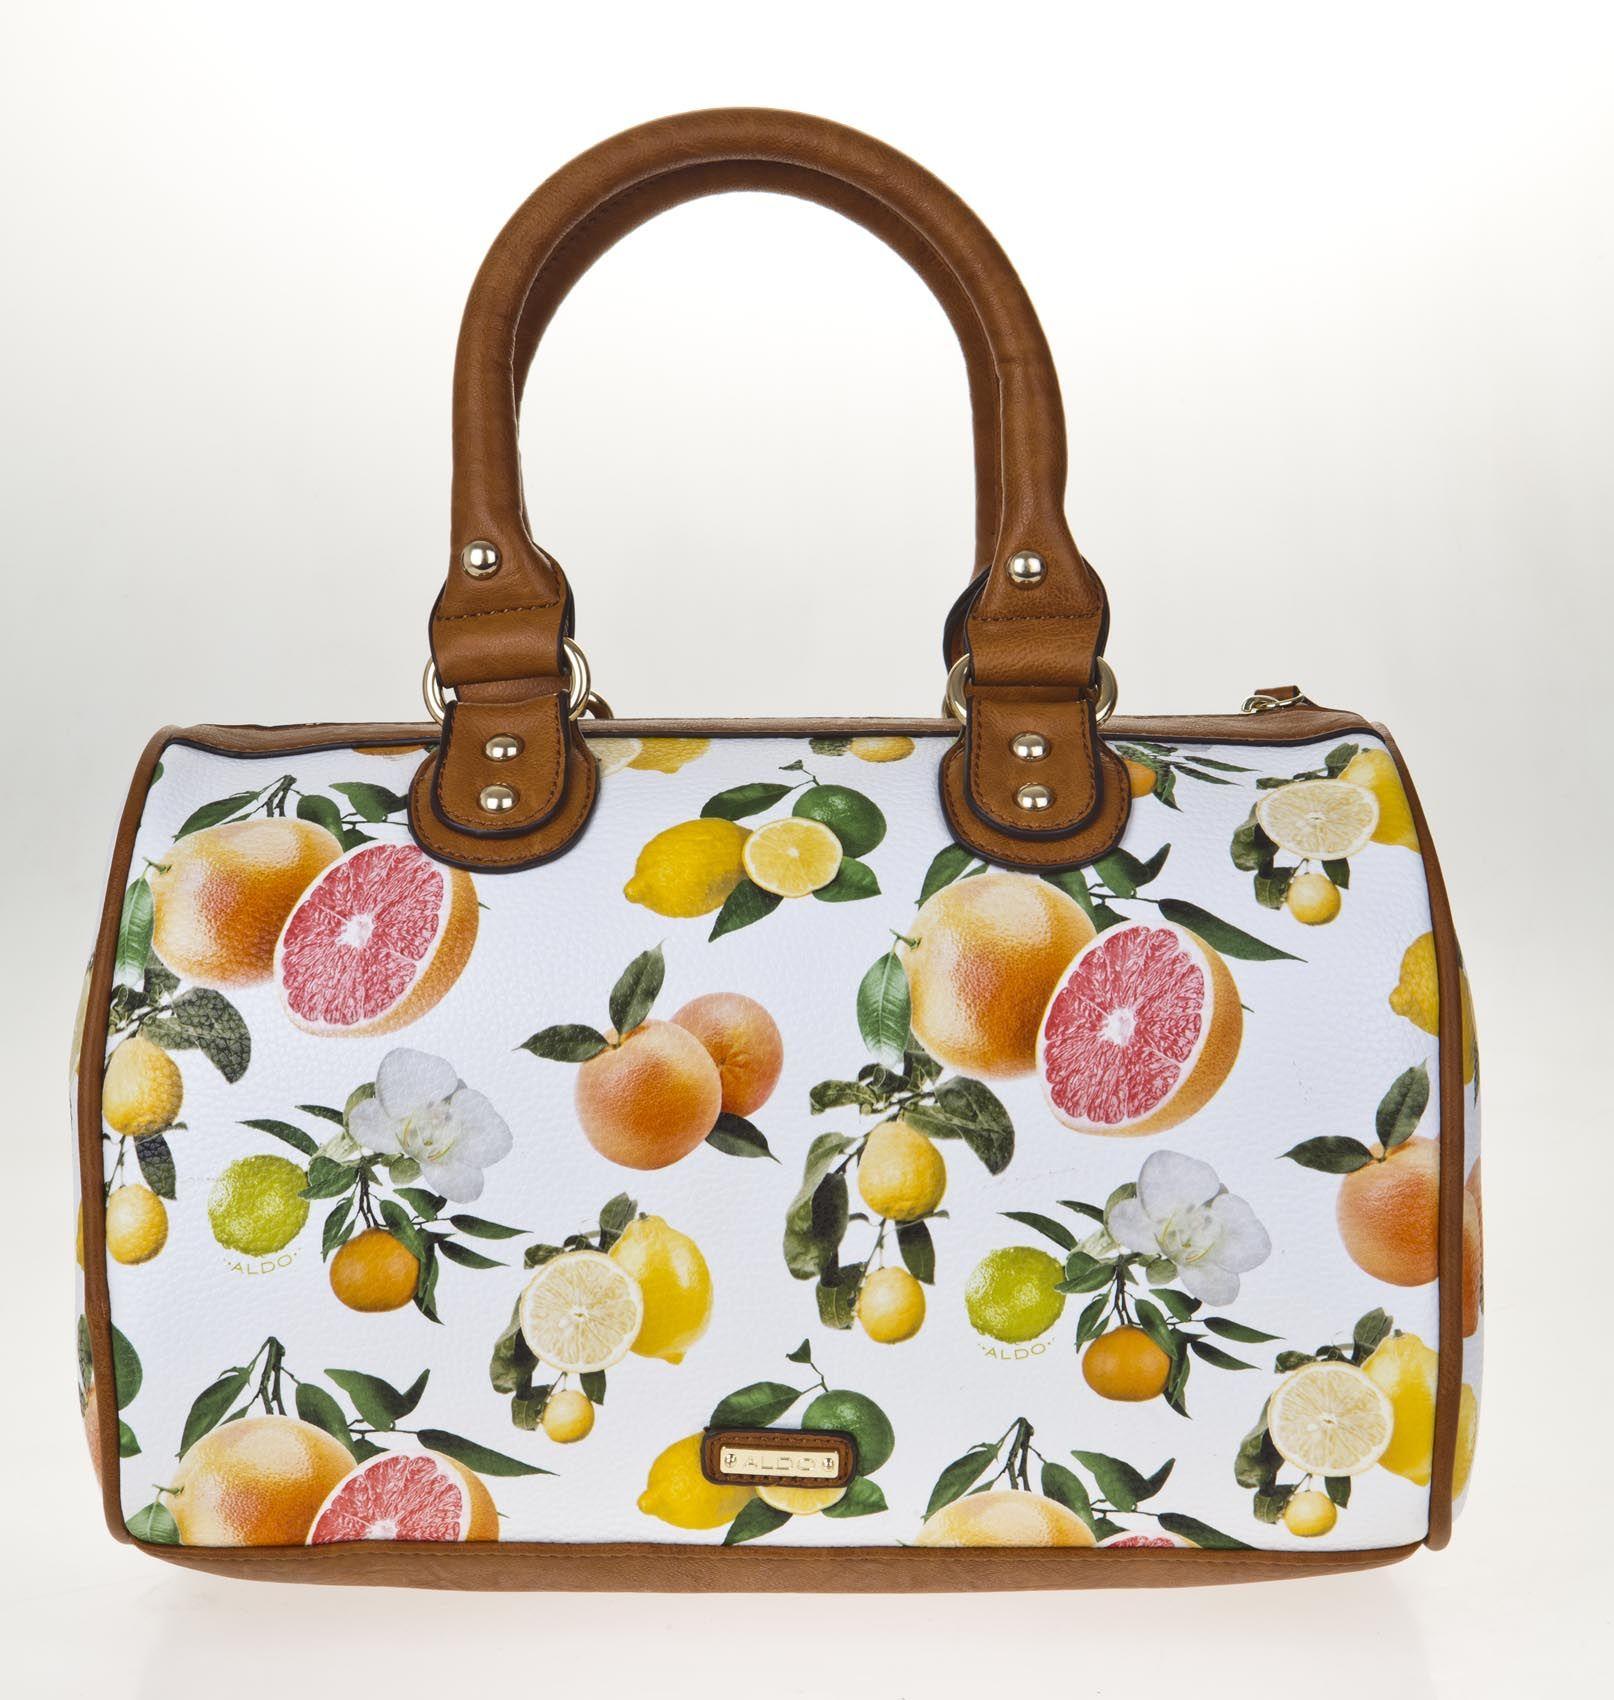 Fruit print bag from Aldo | GLAMOUR summer Pinterest project ...